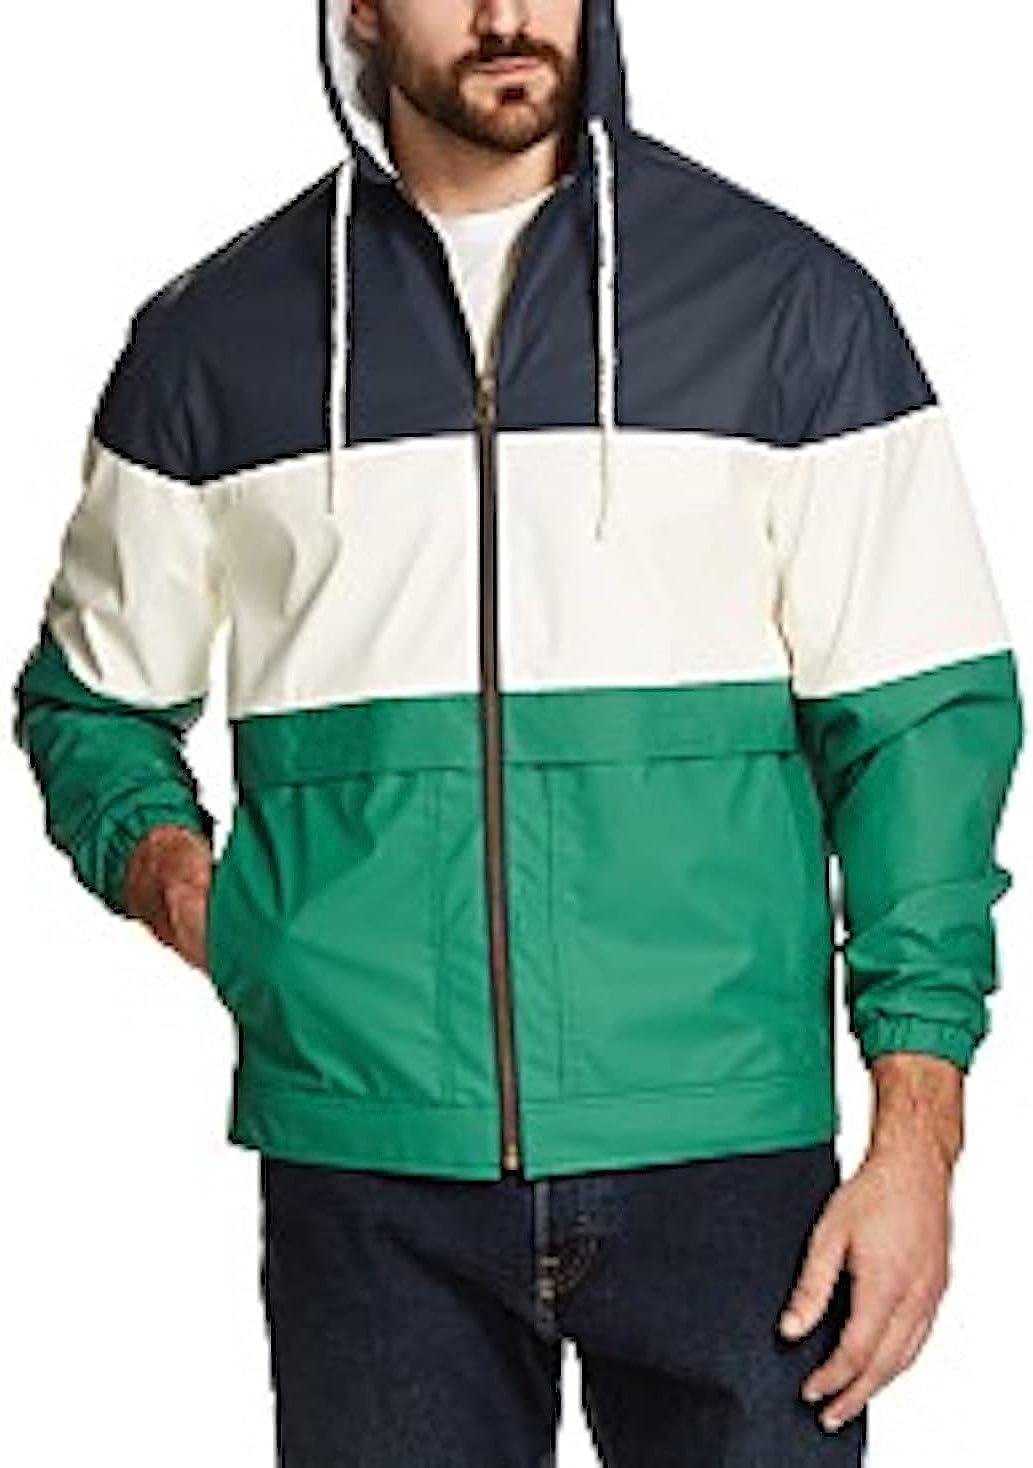 Weatherproof Vintage Men's Dealing full price reduction List price Jacket Slicker Rain